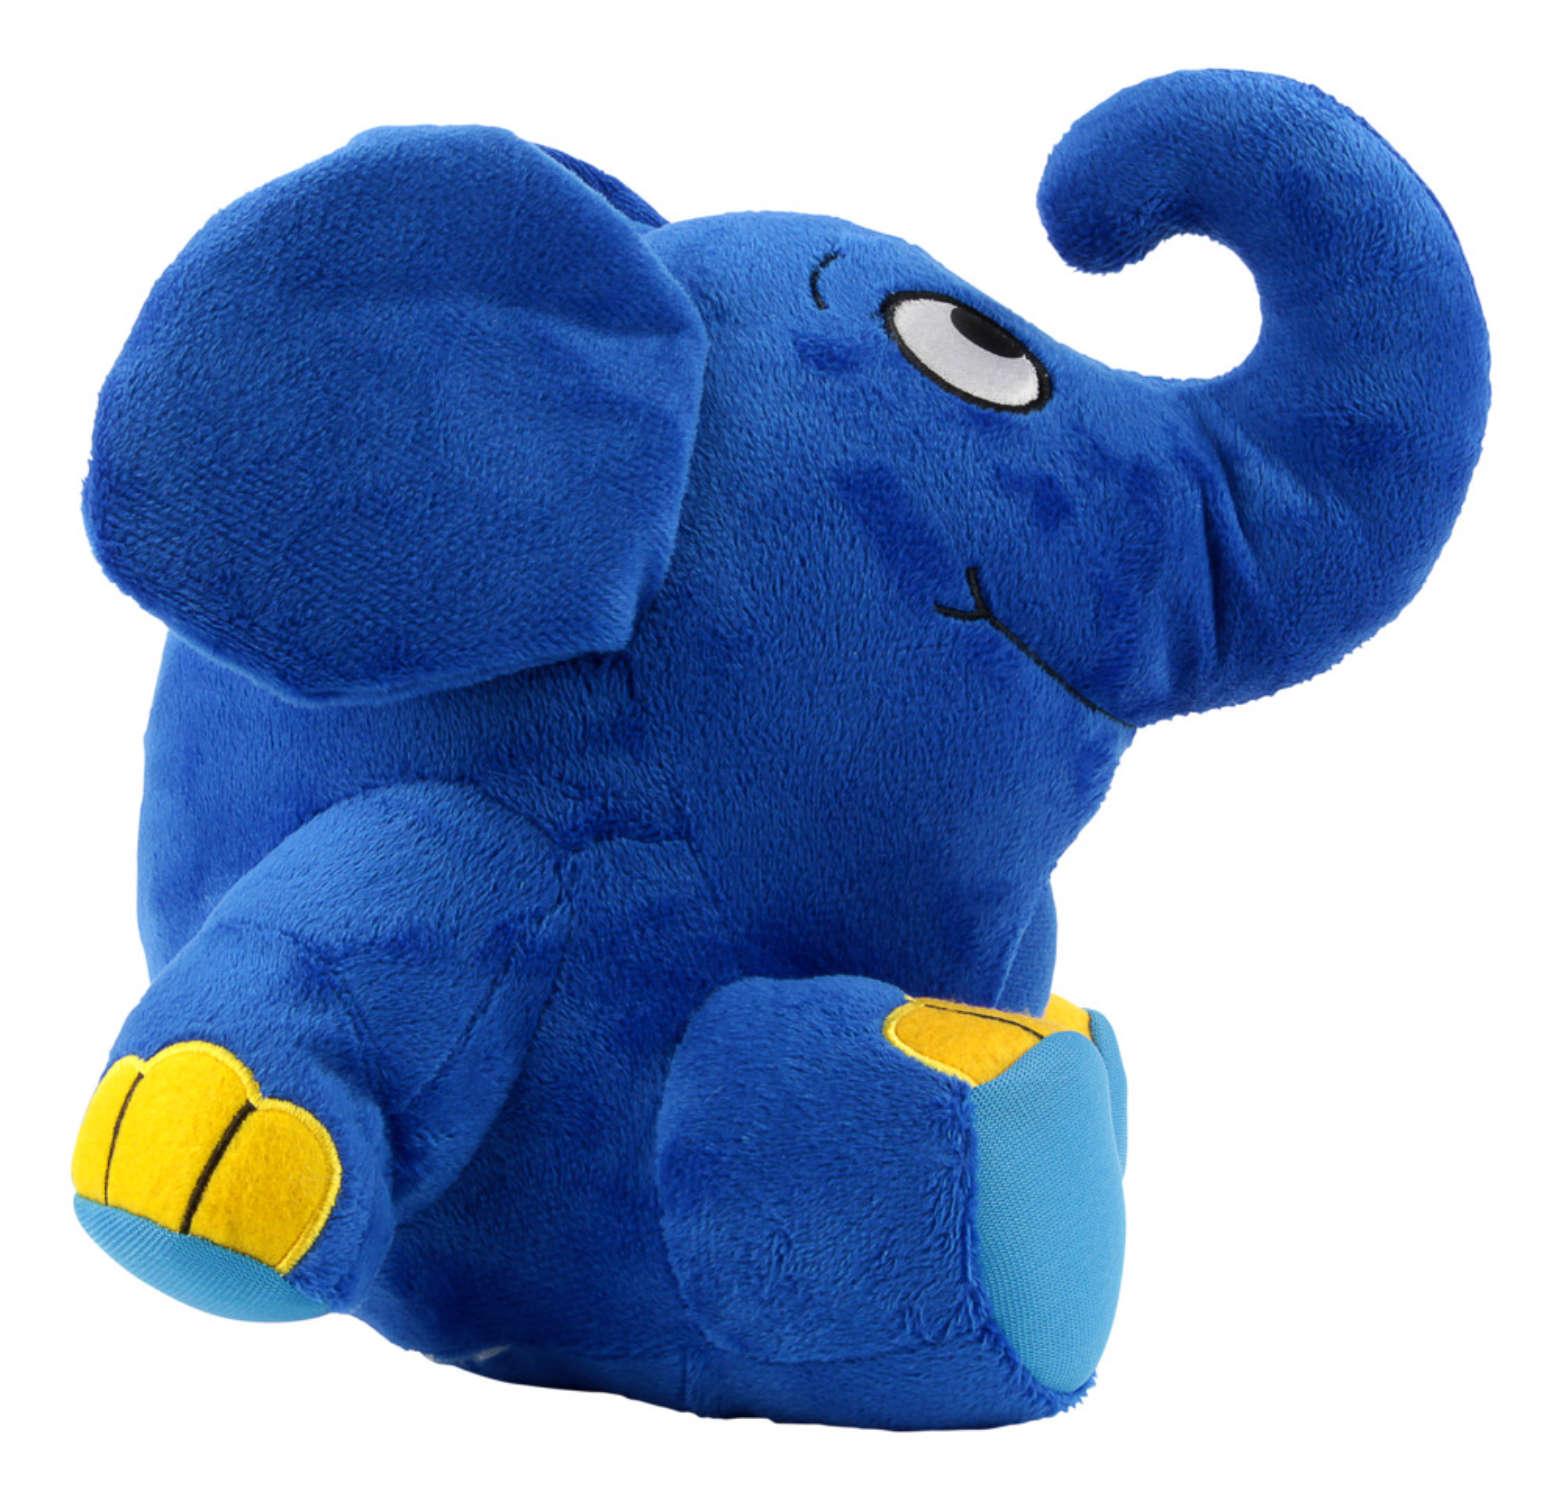 Slumber-Nightlight Elephant